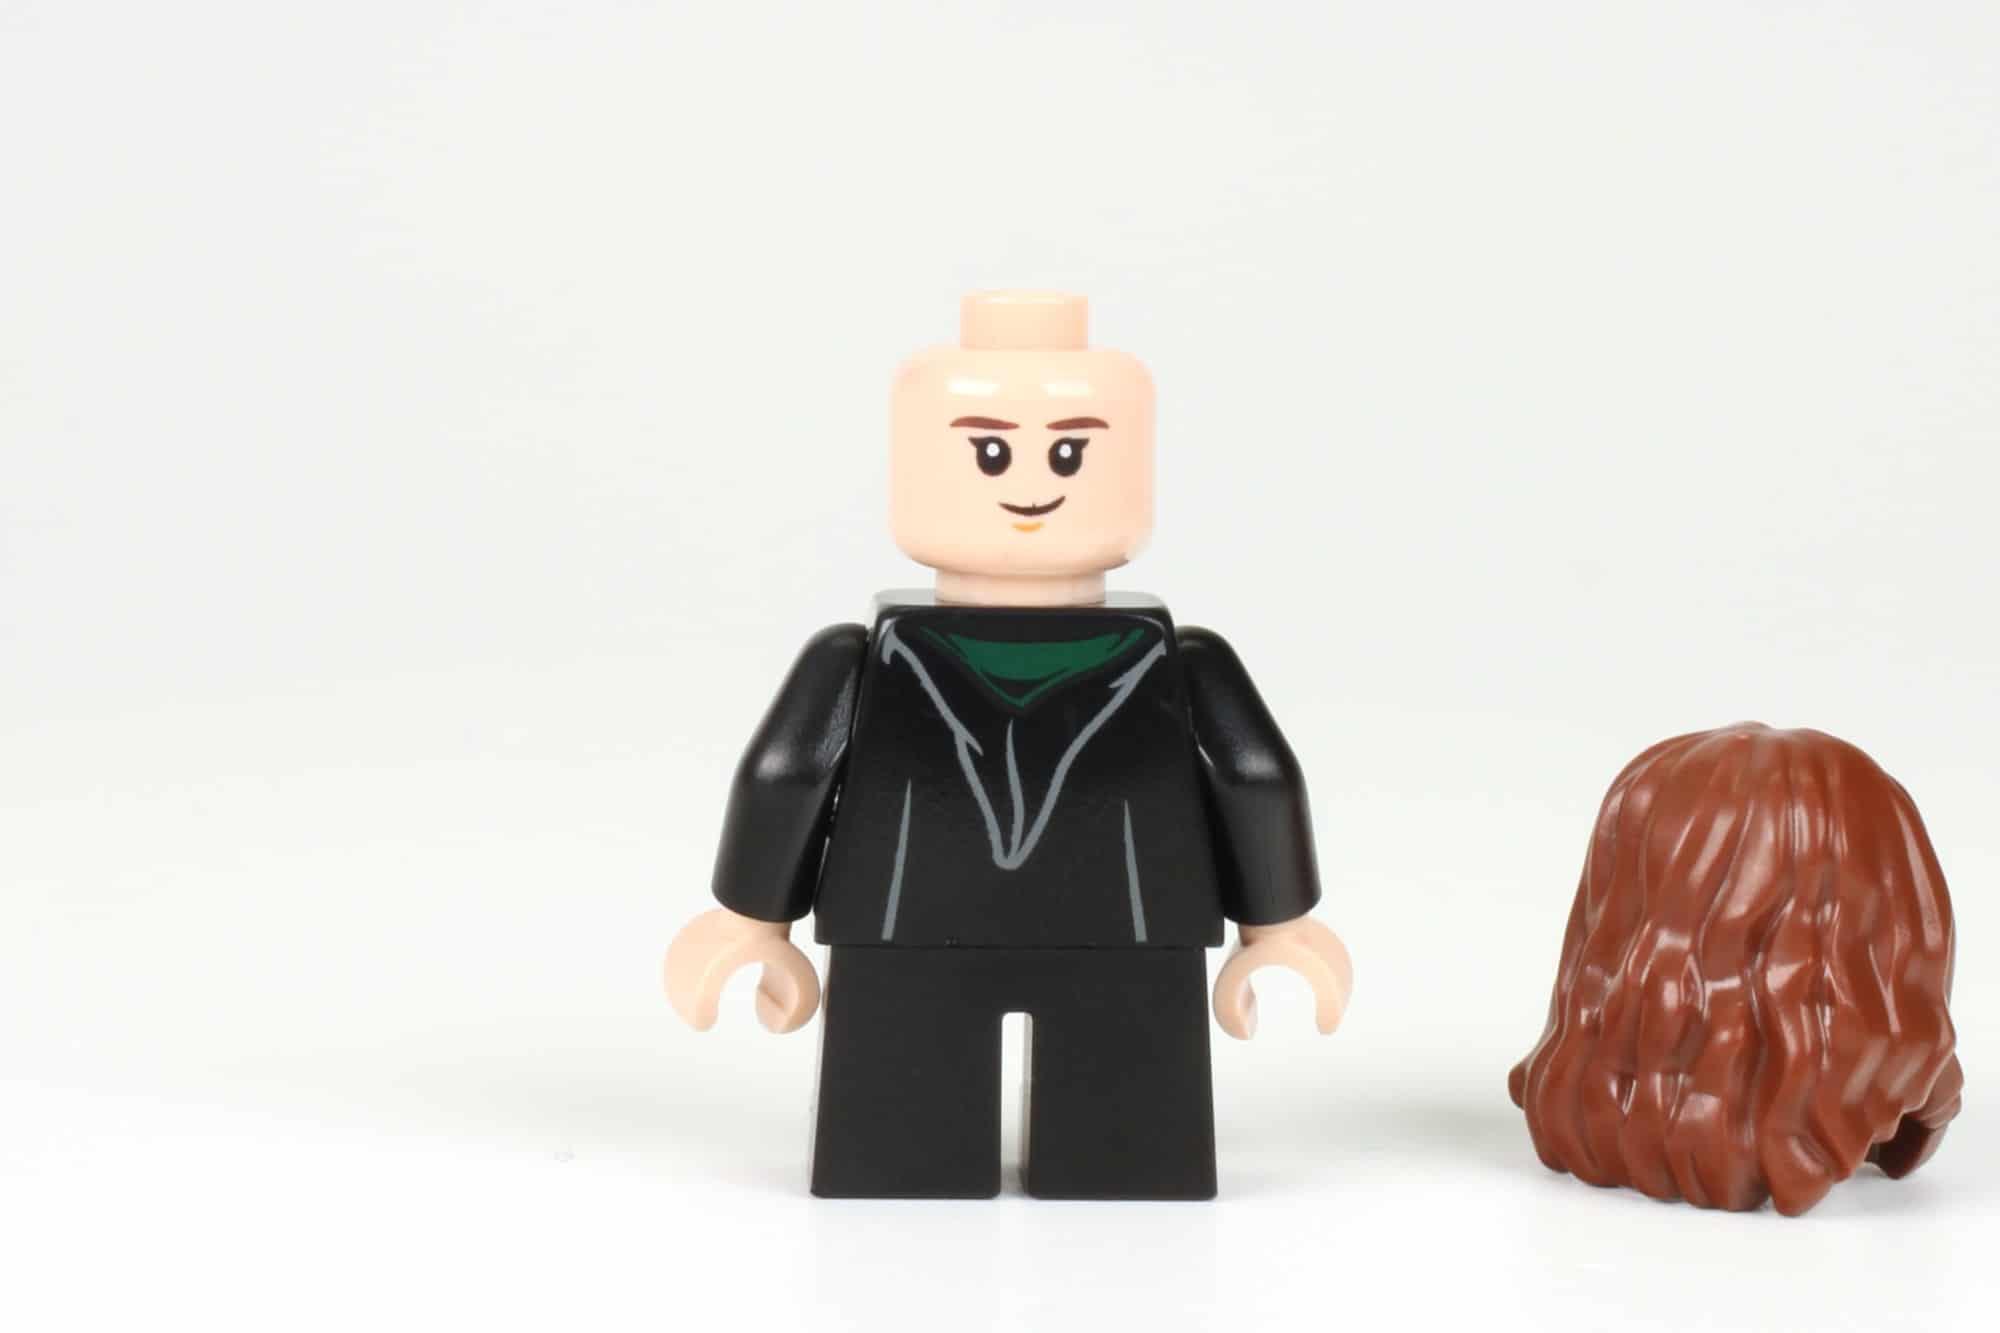 LEGO Harry Potter 76386 Hogwarts Misslungener Vielsafttrank Minifiguren 1 2